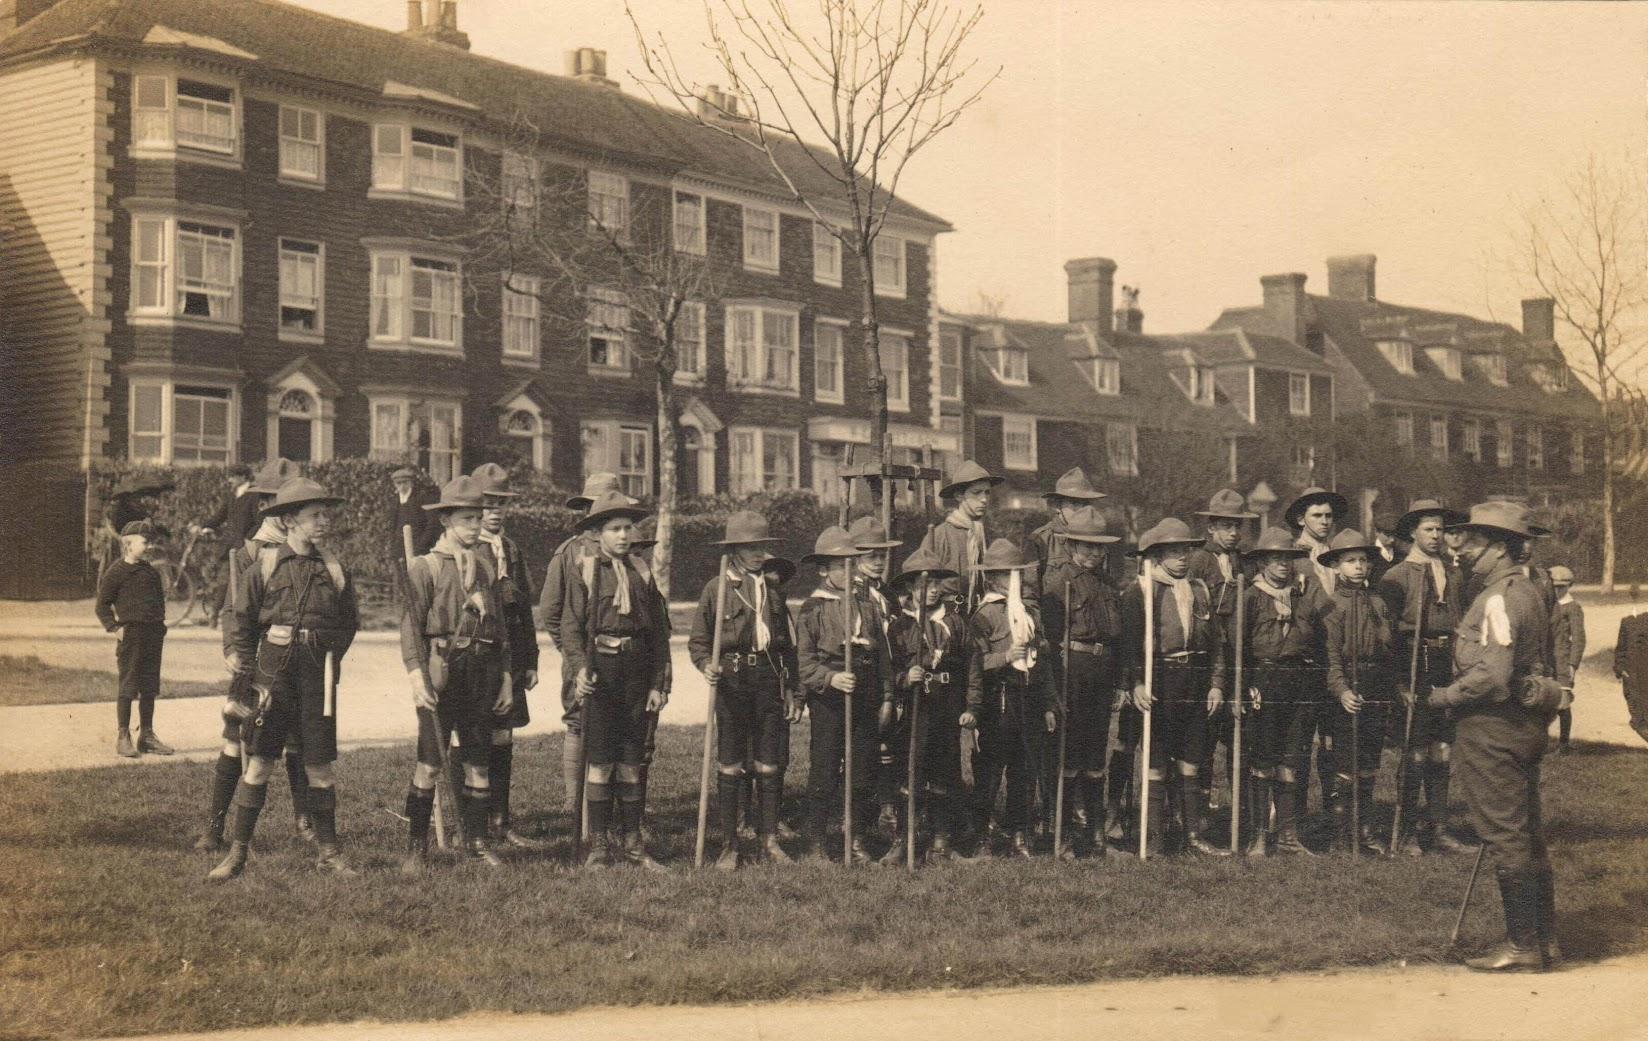 Boy Scouts, Tenterden Troup 28 March 1910